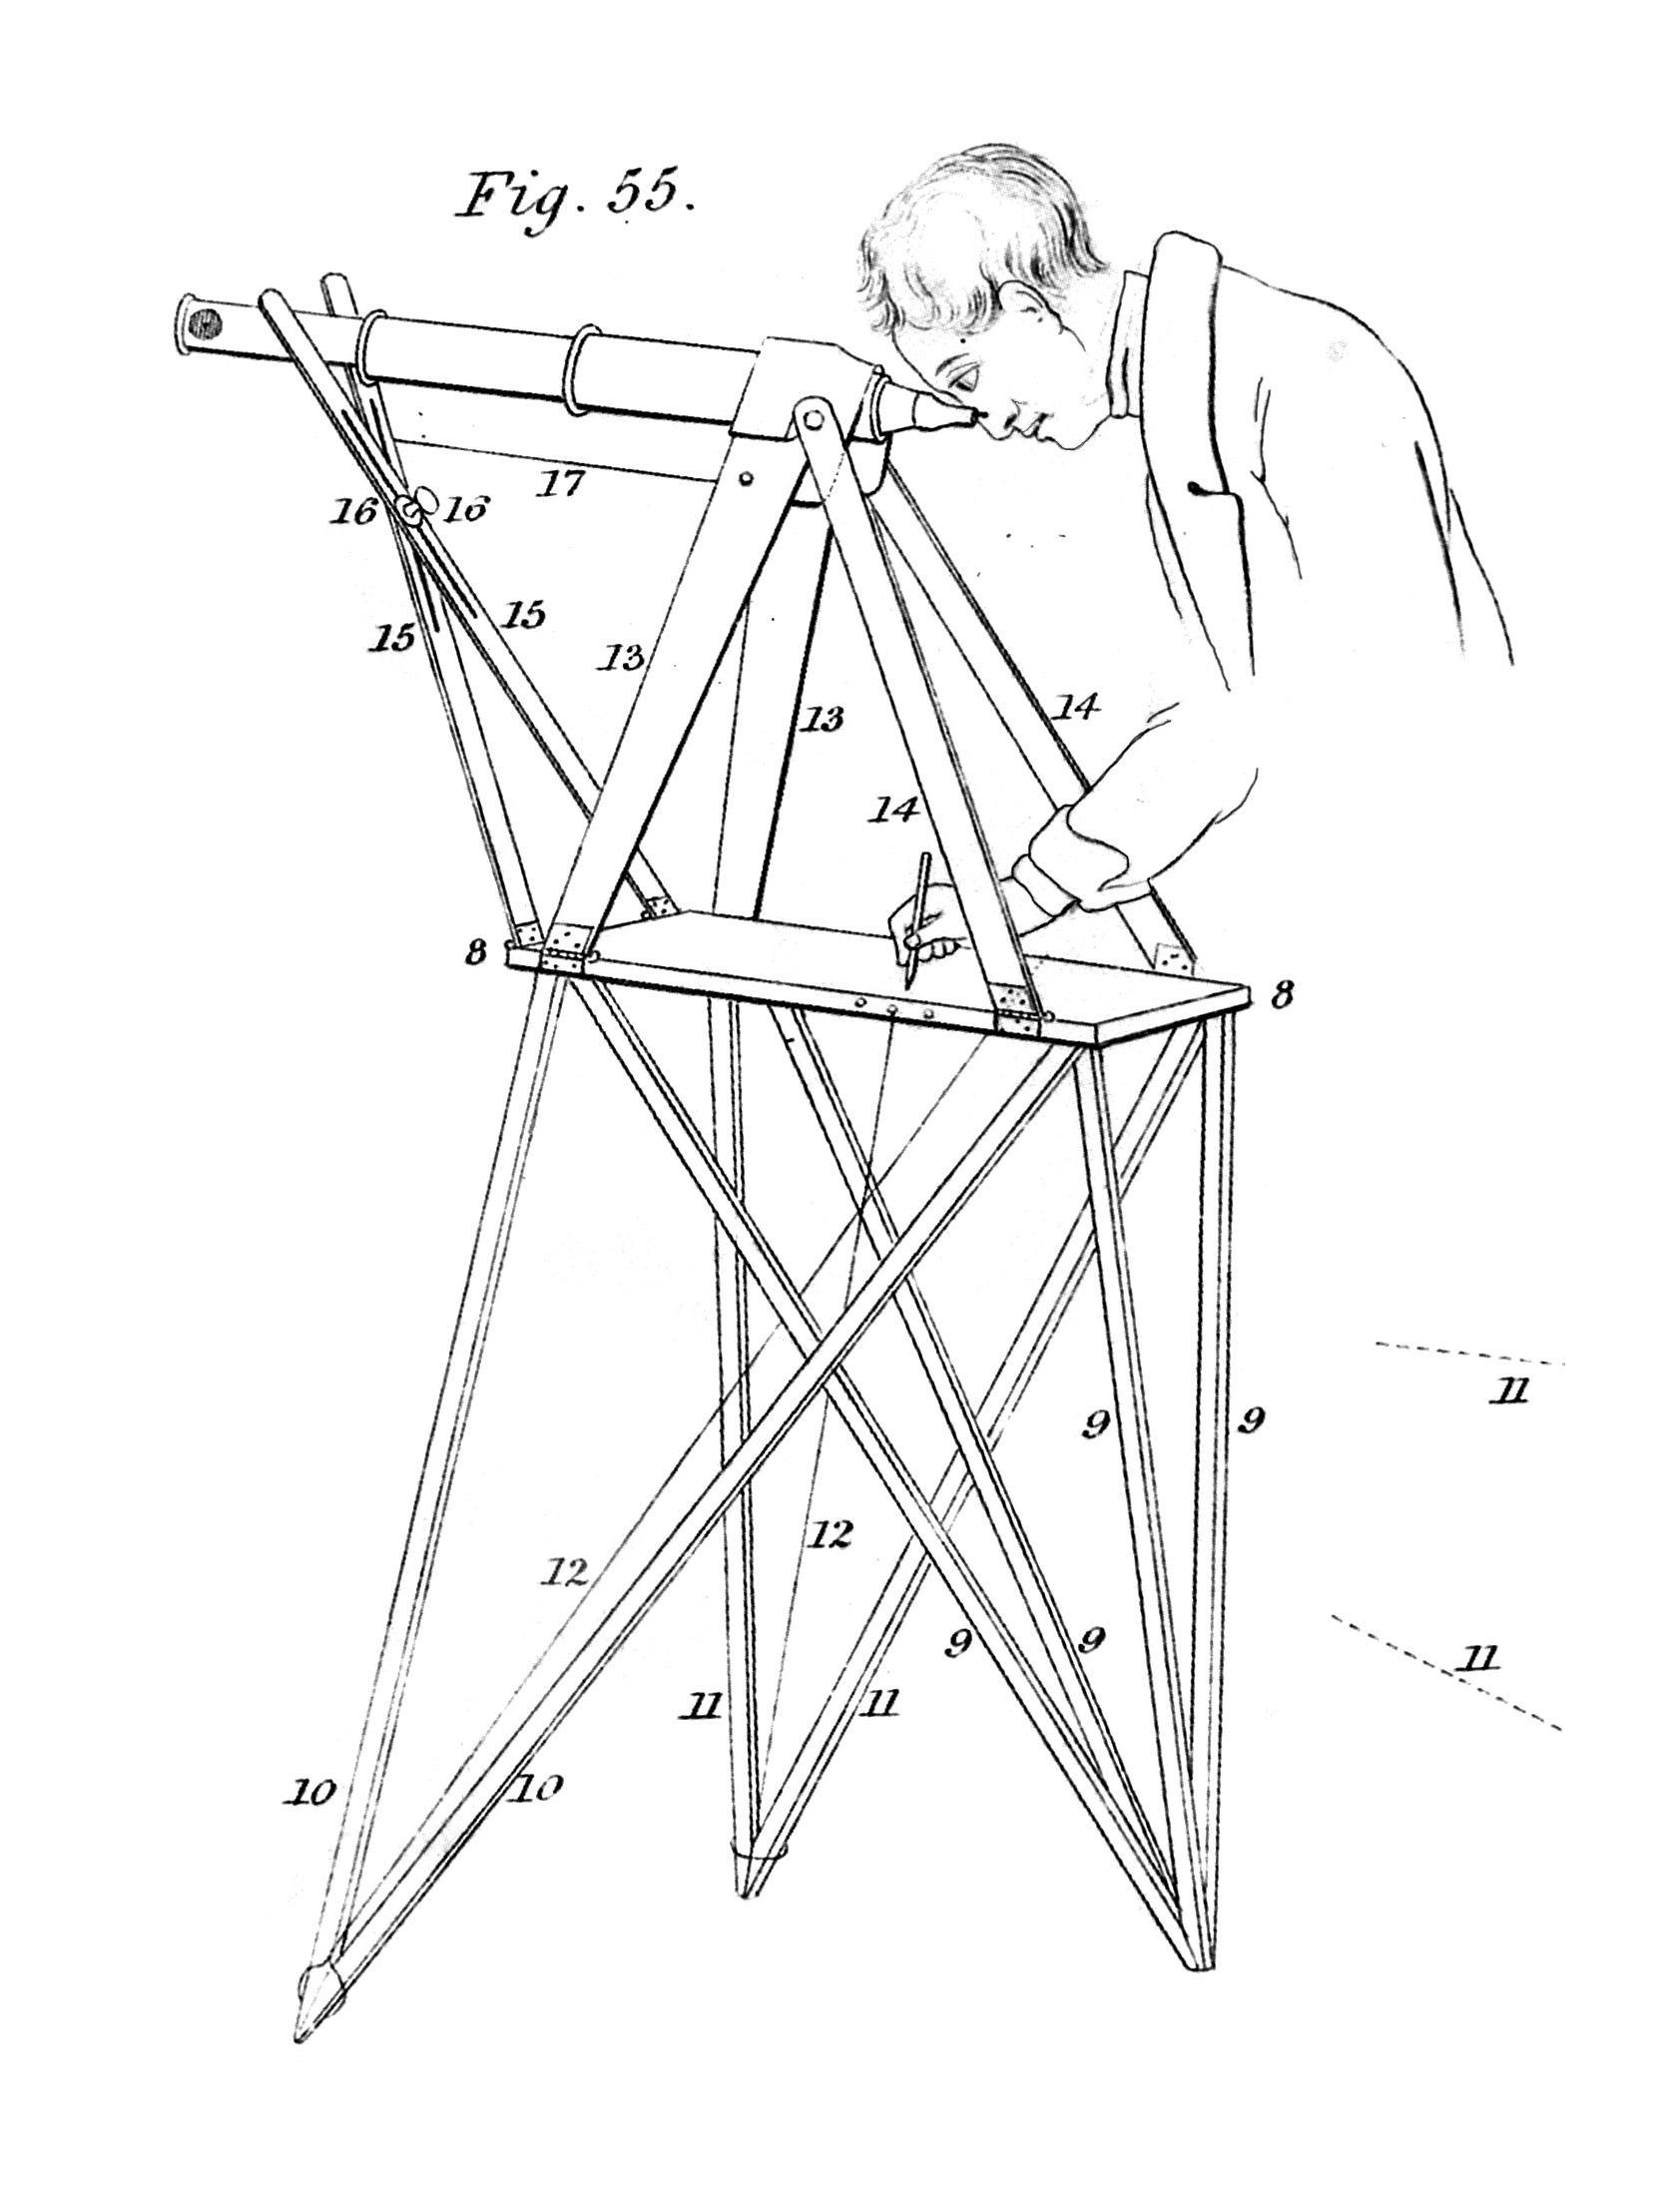 Cornelius Varley's Patent Graphic Telescope, with custom stabilizing table (1836)